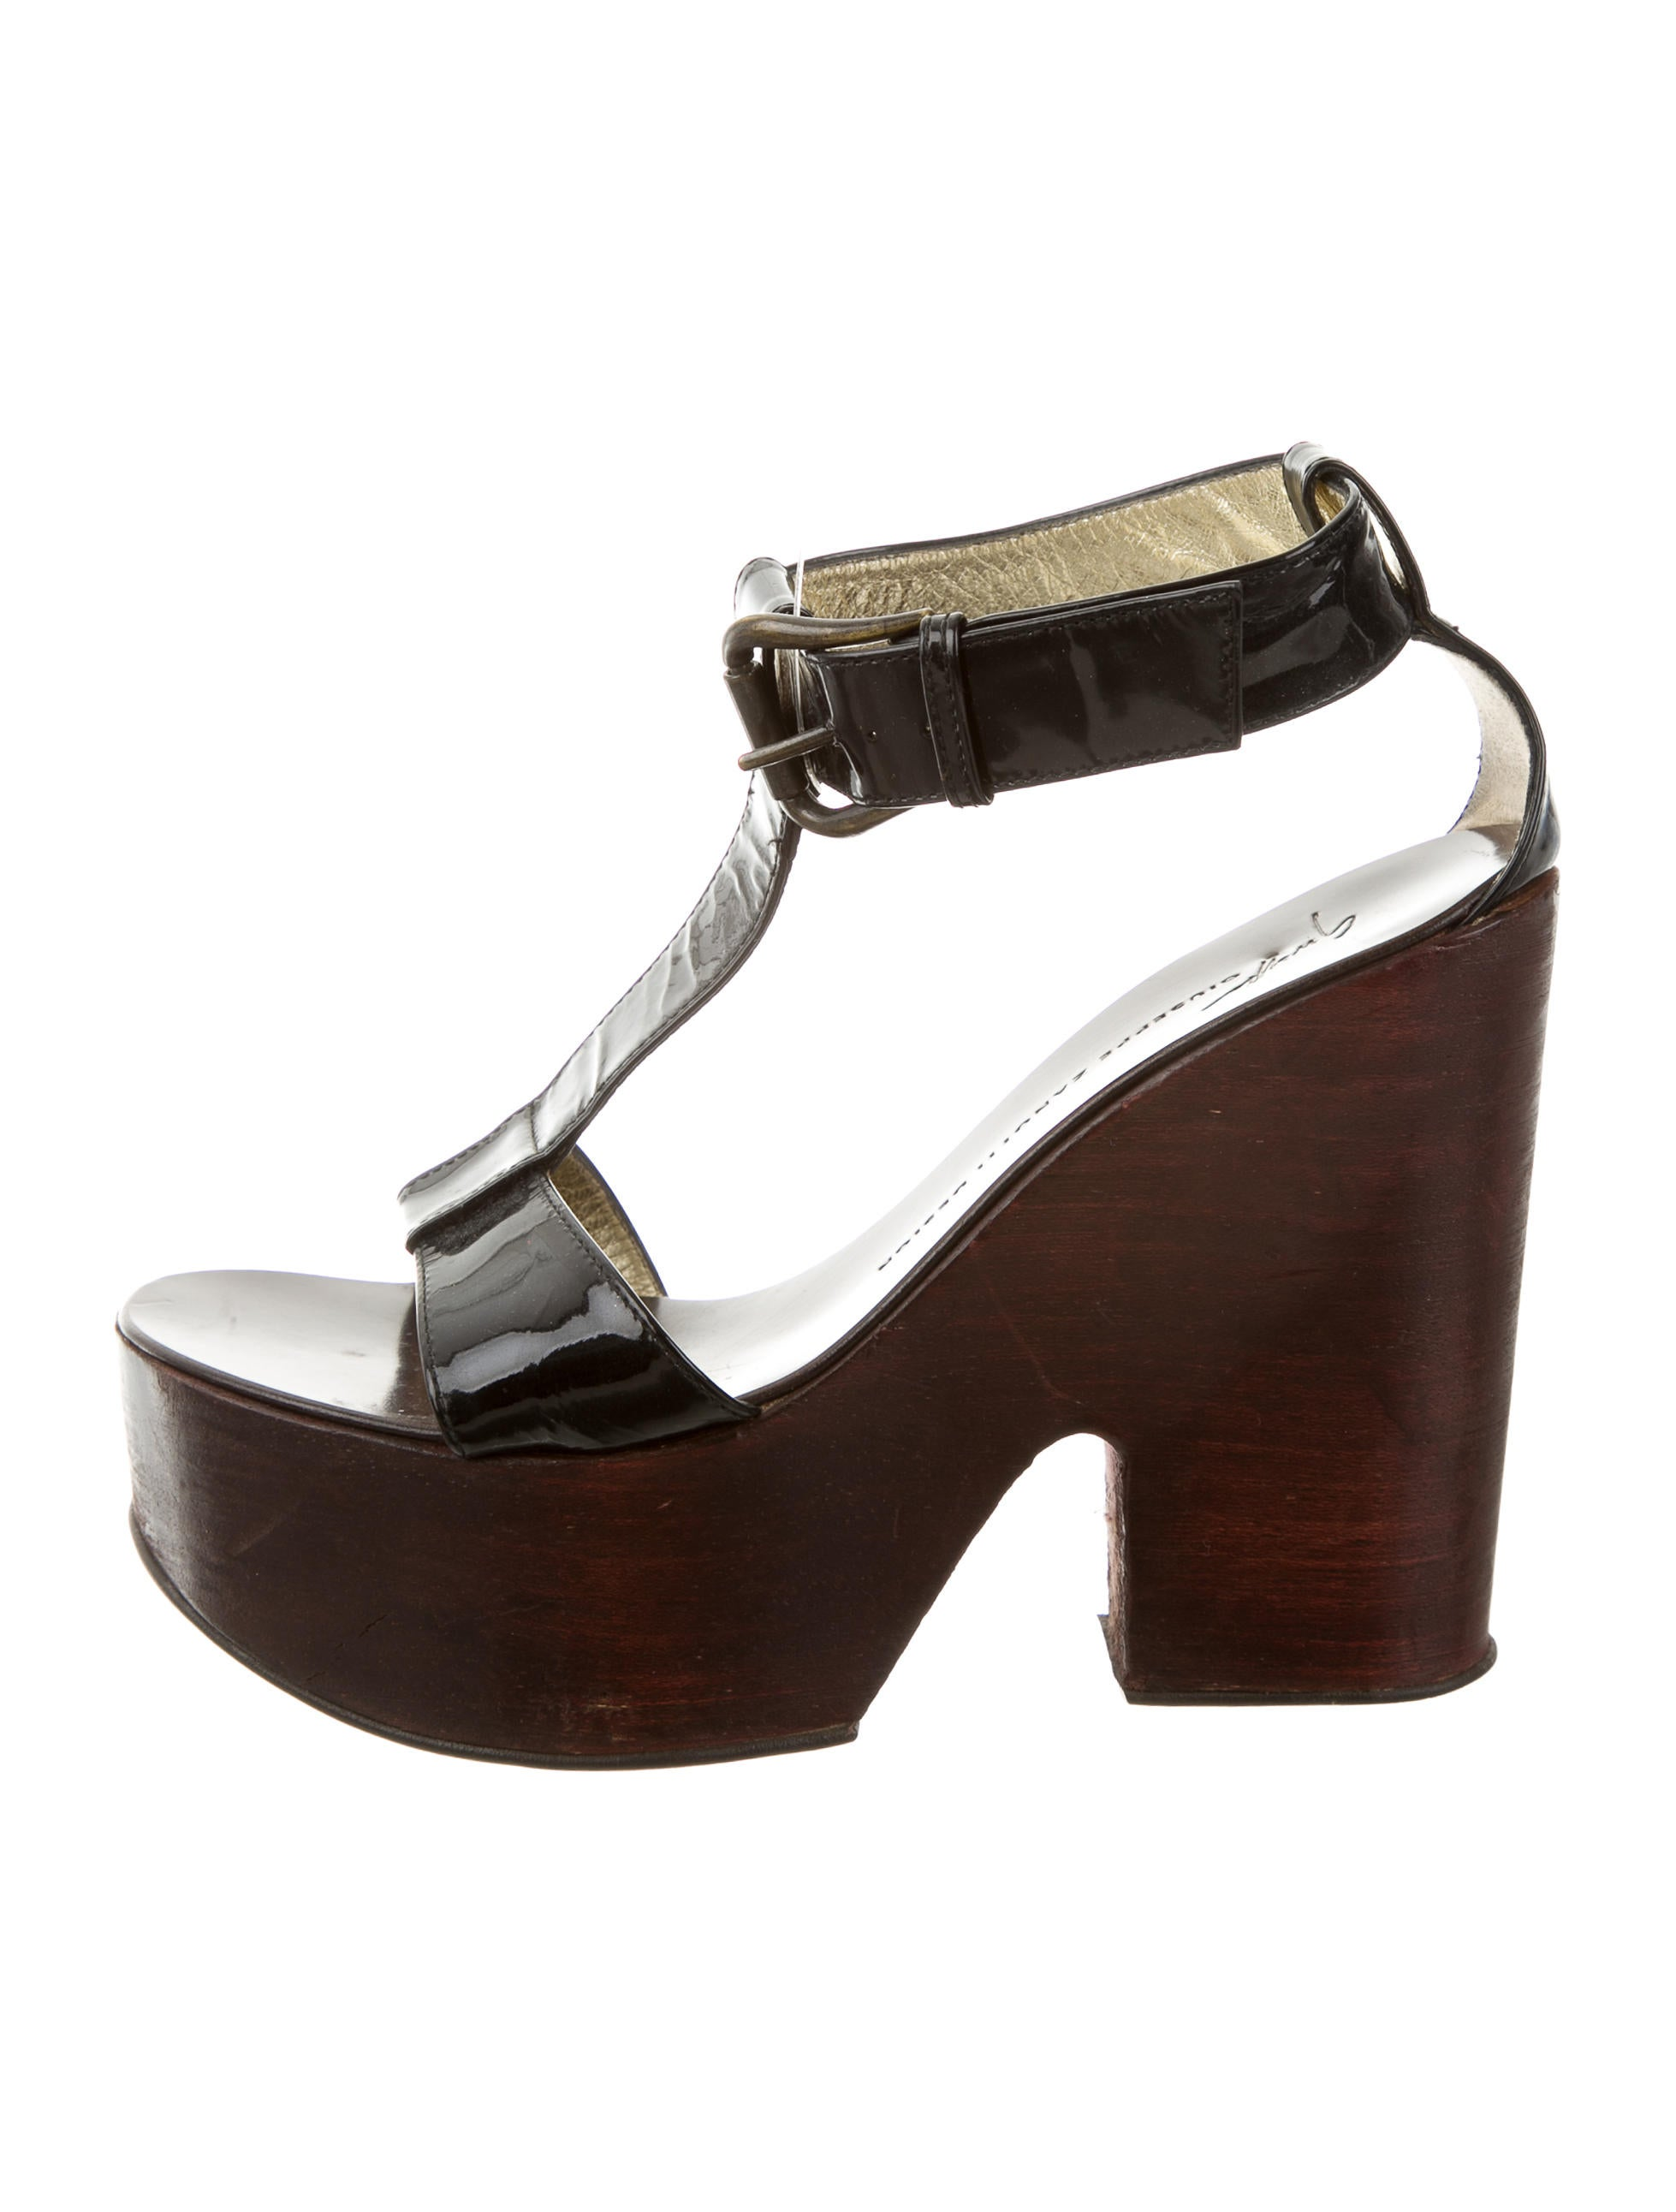 giuseppe zanotti patent leather platform sandals shoes